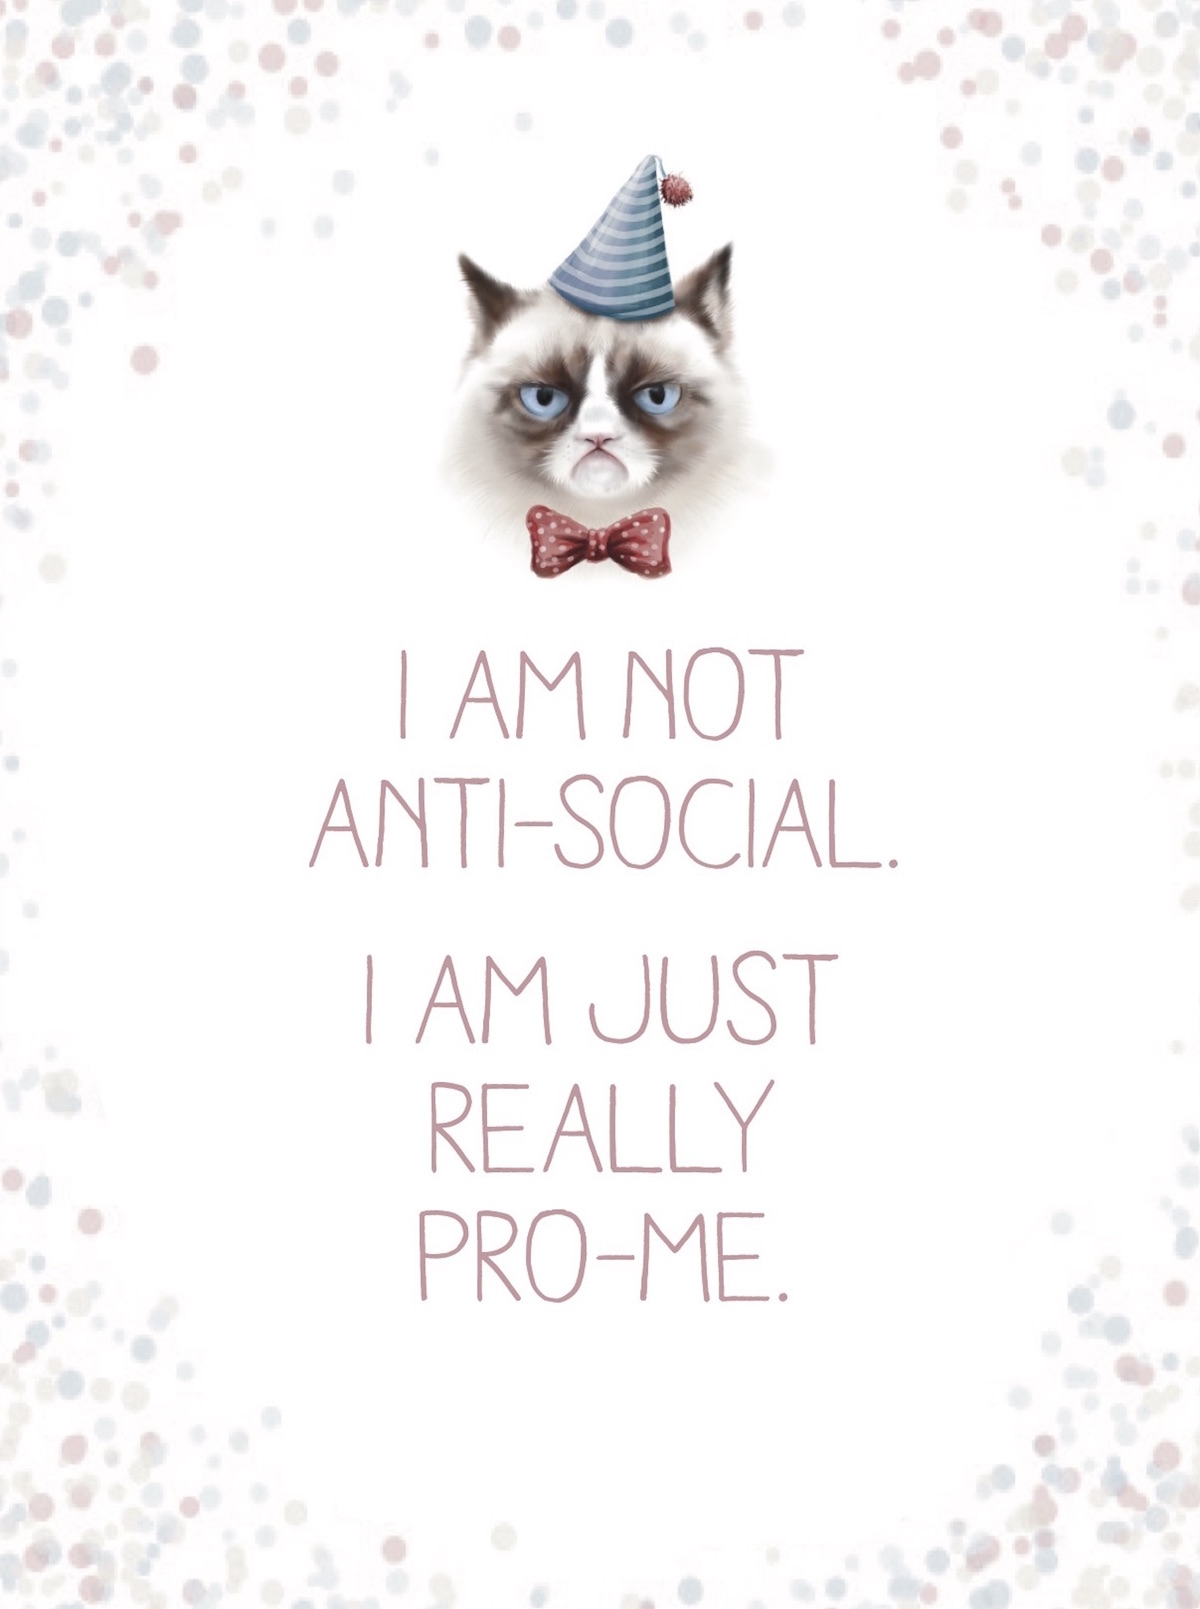 Spreuk van de week: I am not anti-social, I am just really pro-me